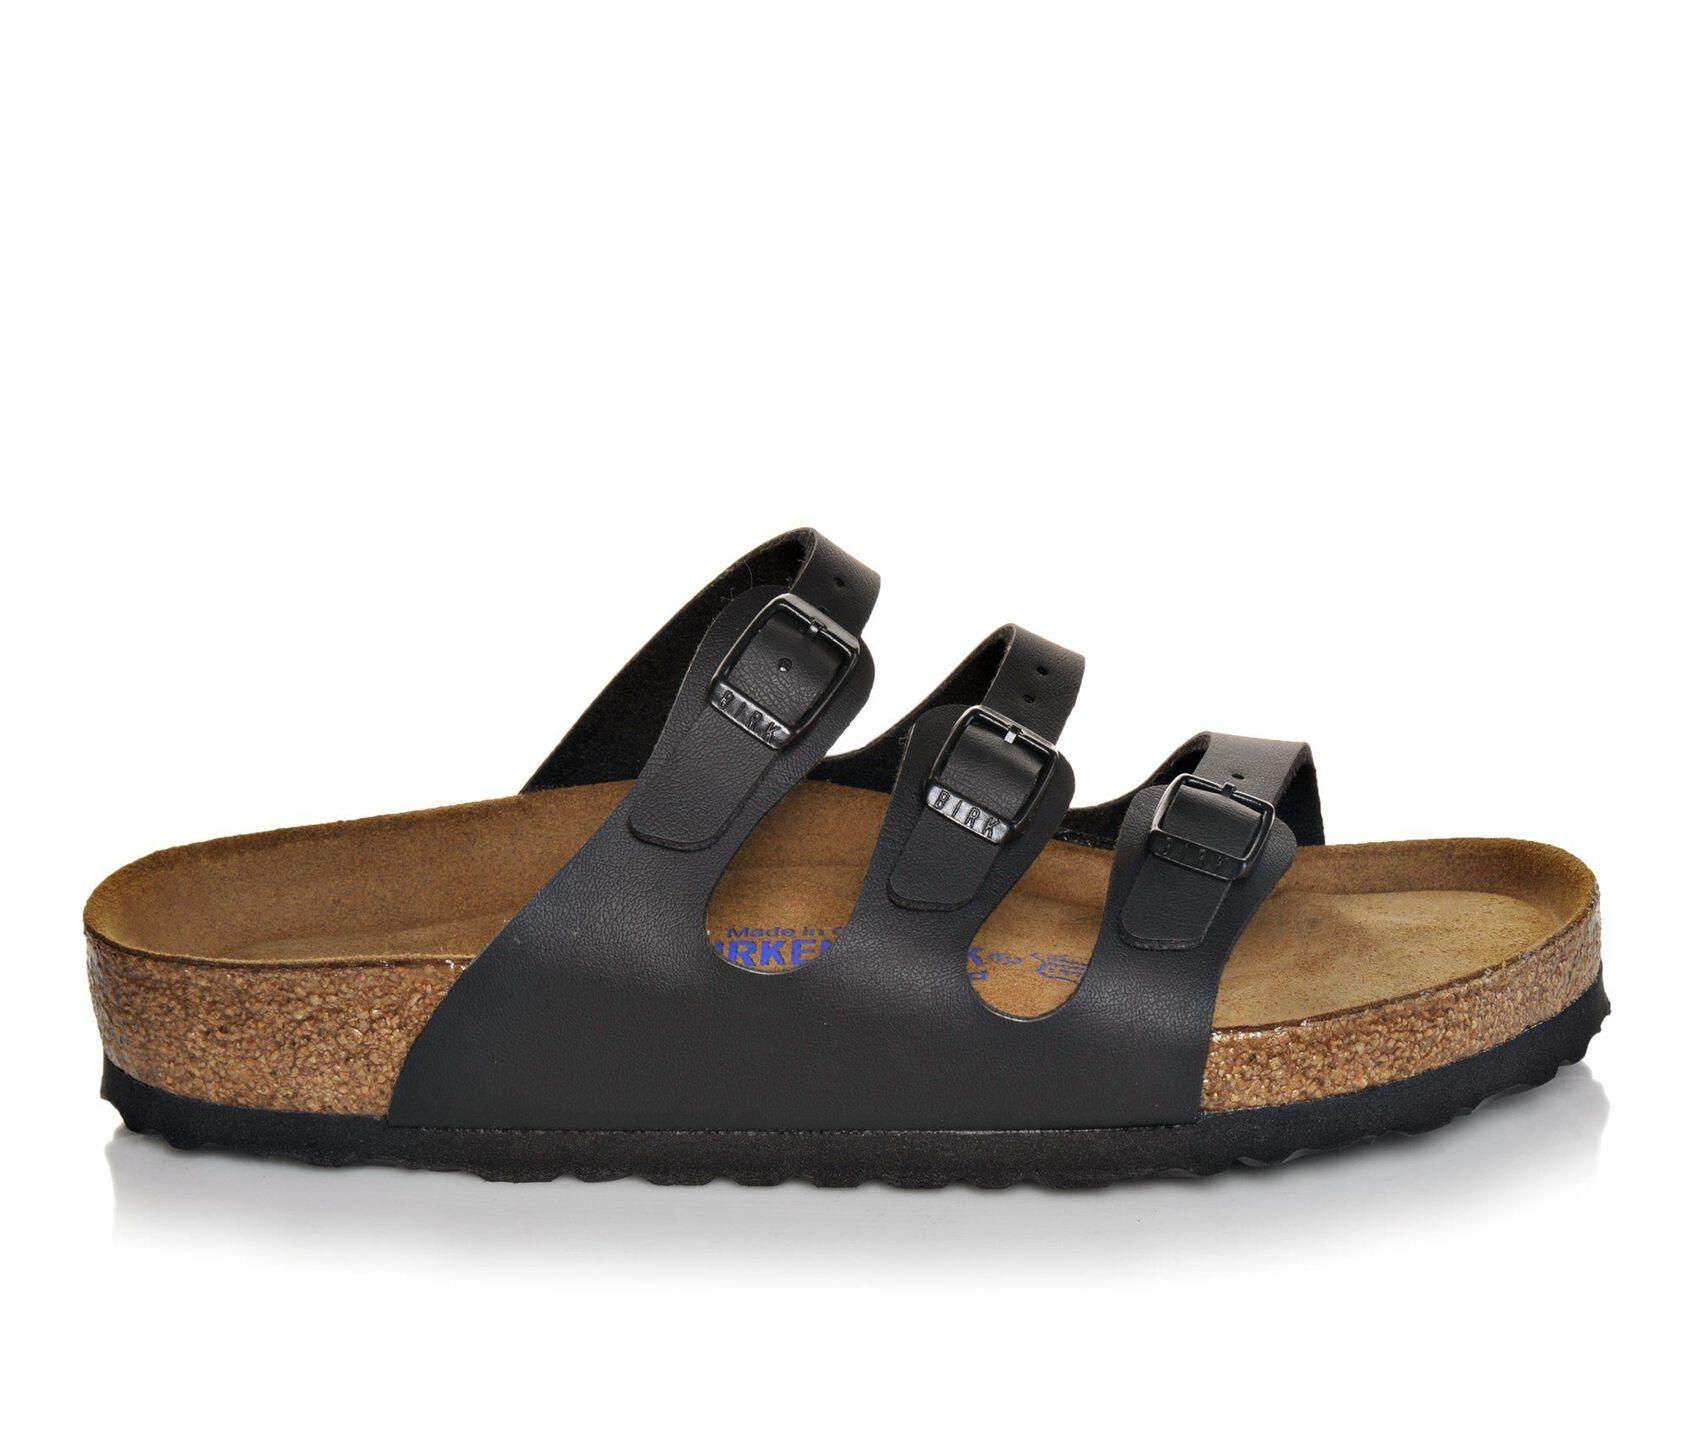 b0ff4b244 Women's Birkenstock Florida Strappy Footbed Sandals   Shoe Carnival